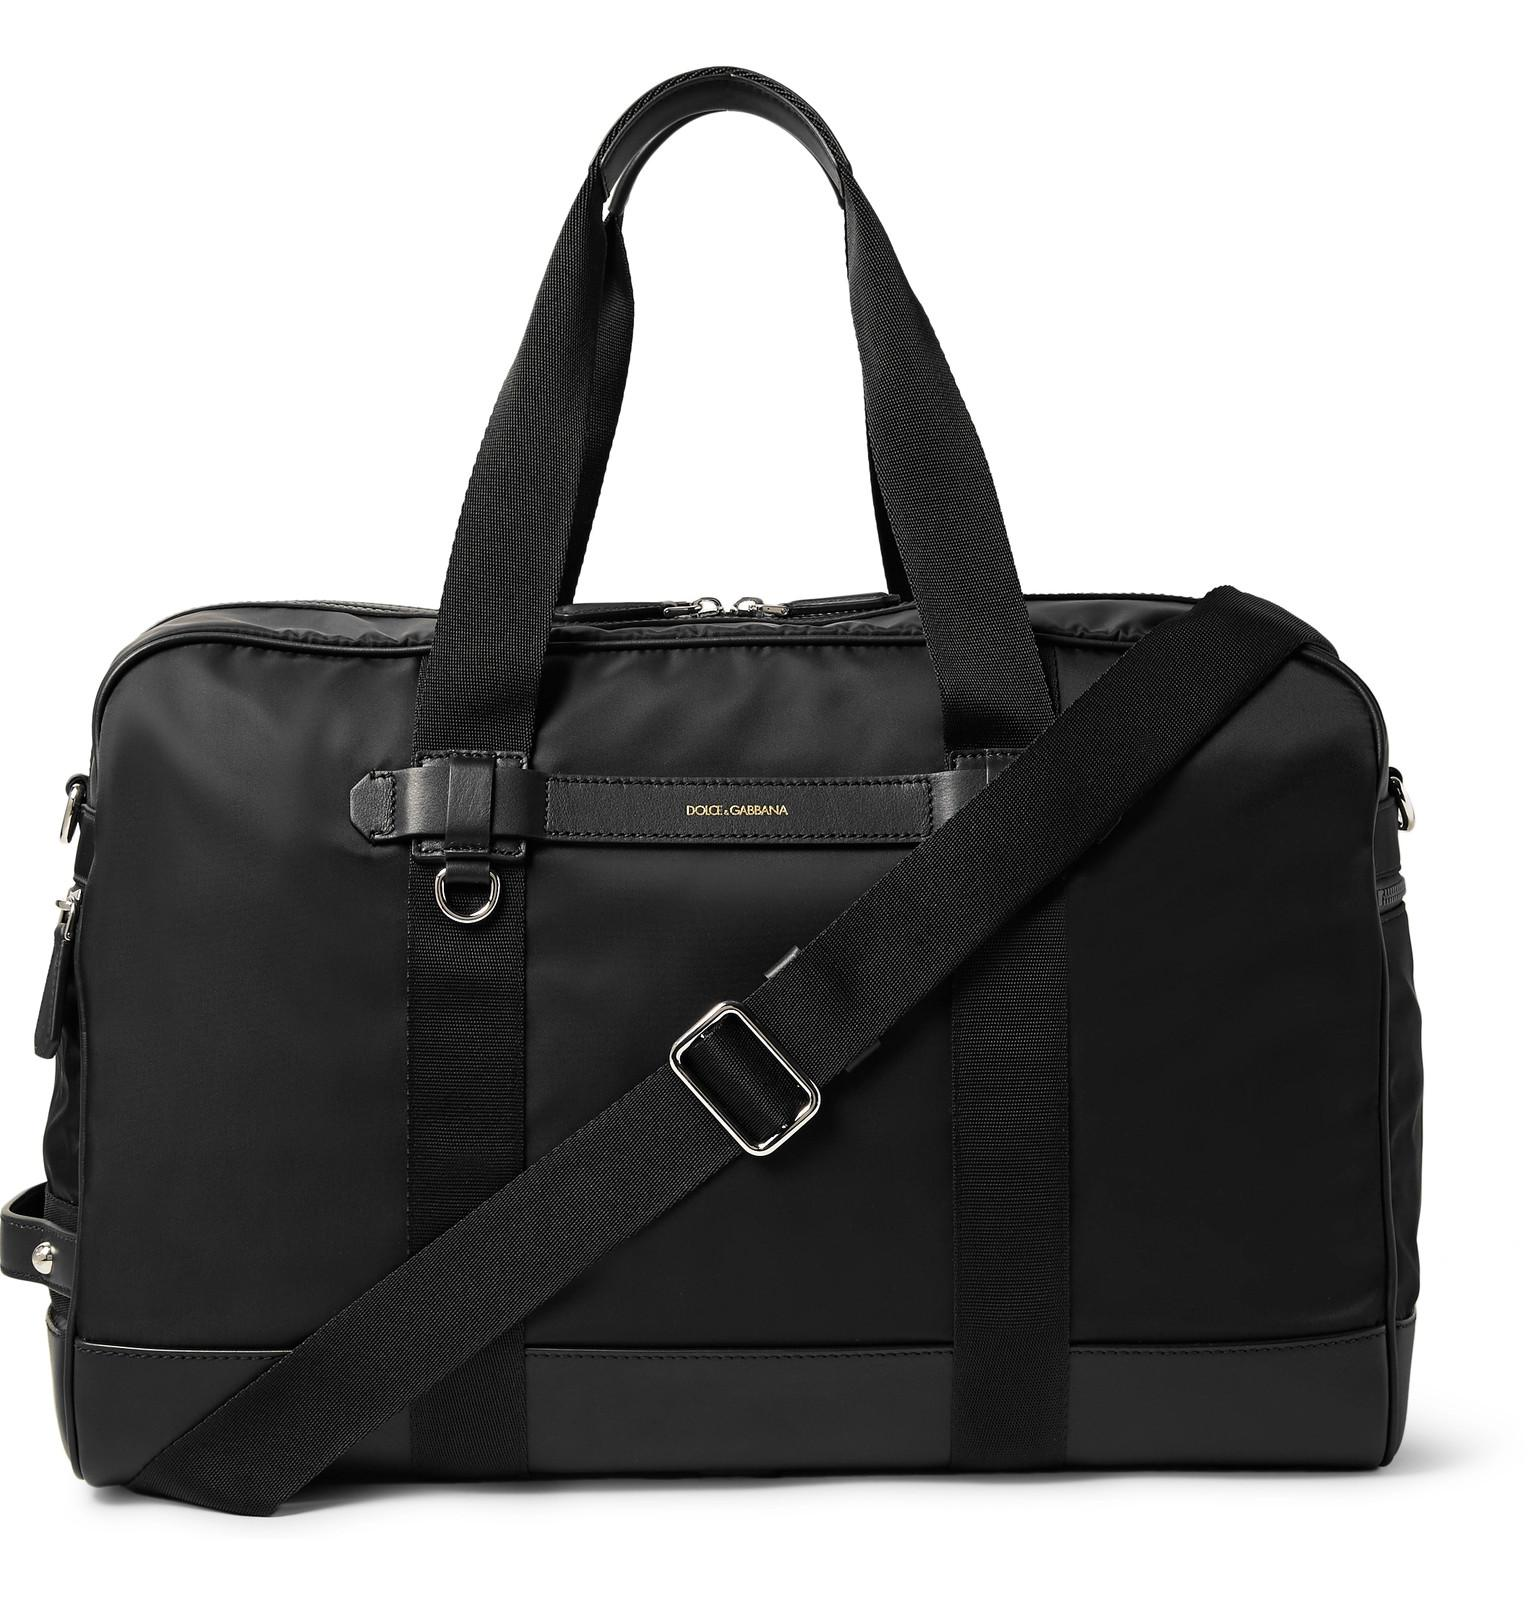 13da38f7cff4 Lyst - Dolce   Gabbana Leather-trimmed Nylon Holdall in Black for Men